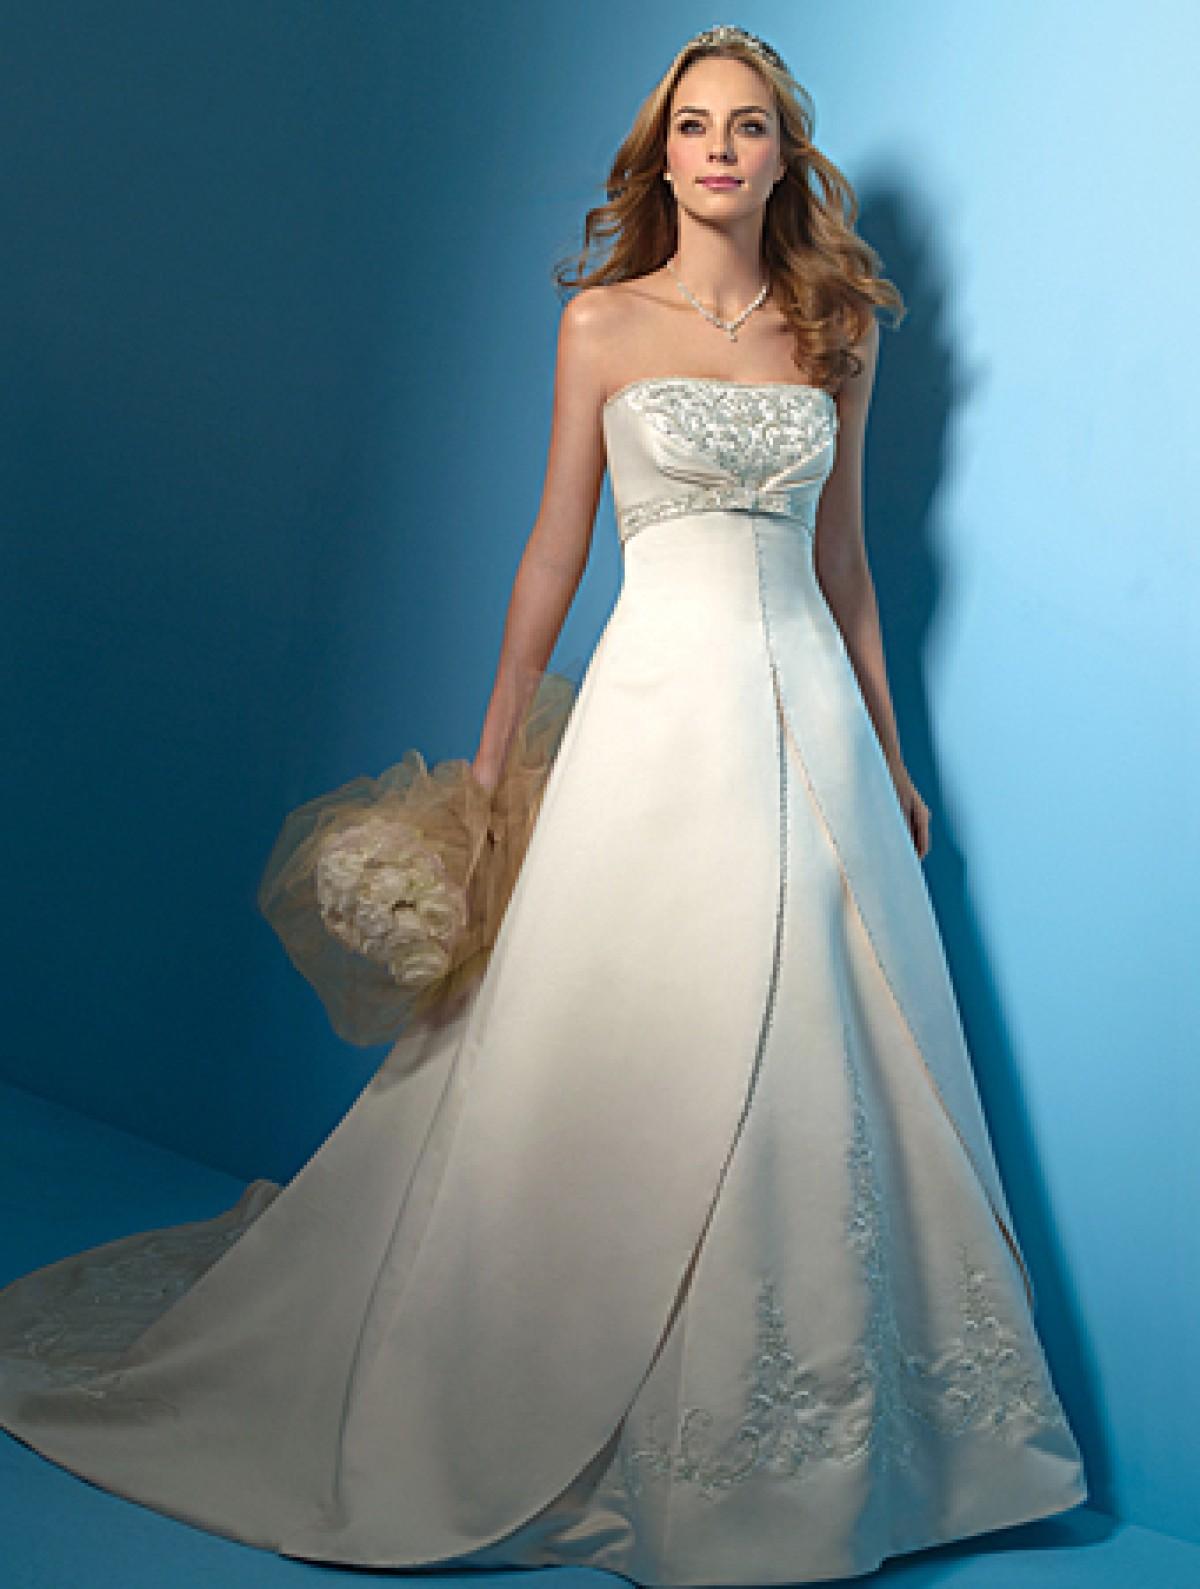 d47aa0d6df3 Convertible Wedding Dress Alfred Angelo - Gomes Weine AG